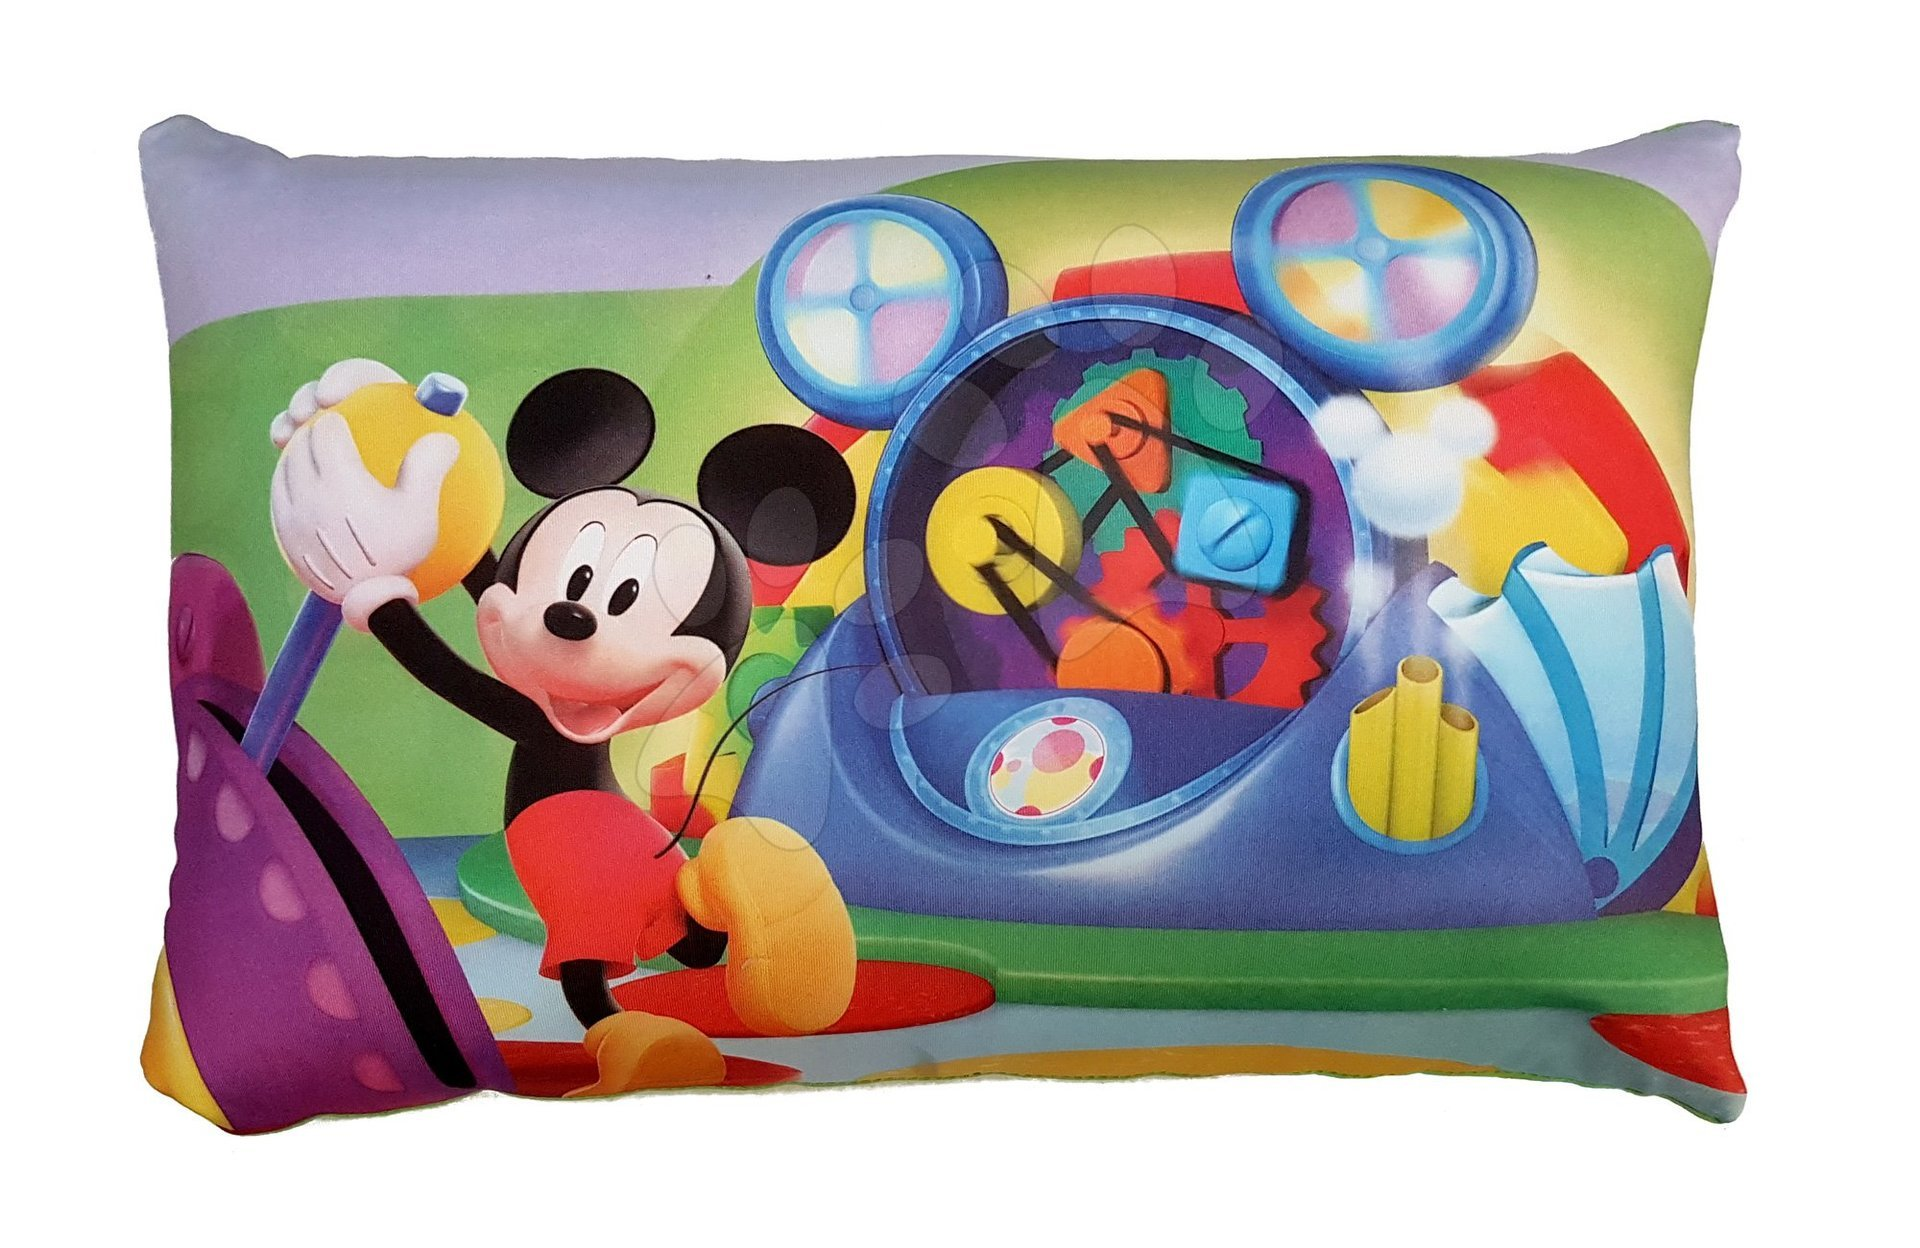 Polštář Mickey Mouse mechanik Ilanit 42*28 cm